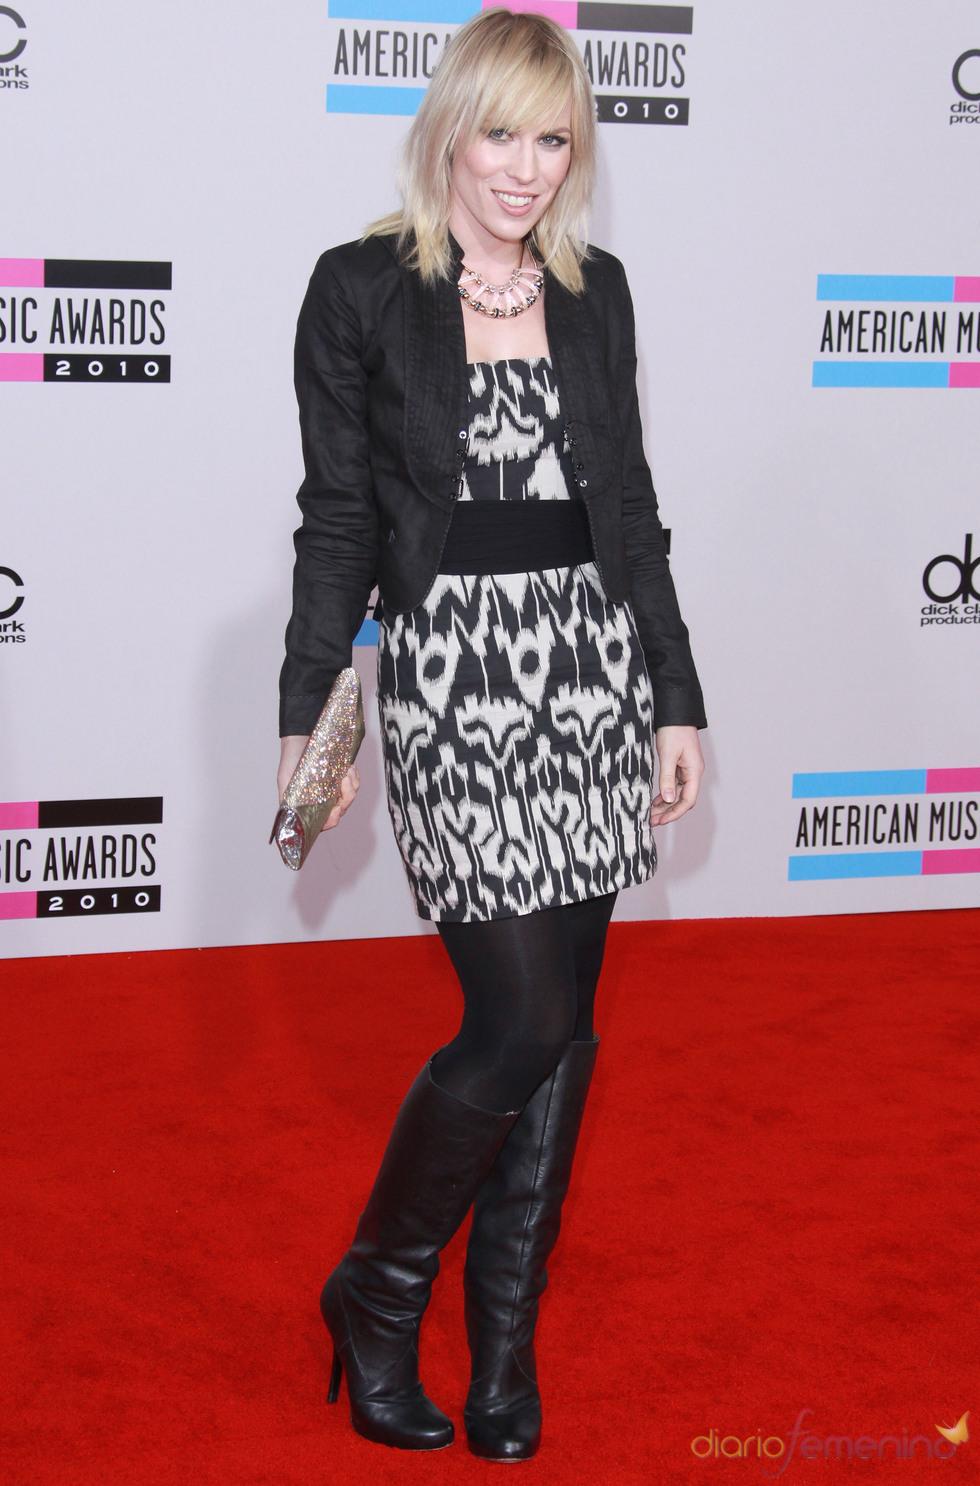 Natasha Bedingfield en los American Music Awards 2010